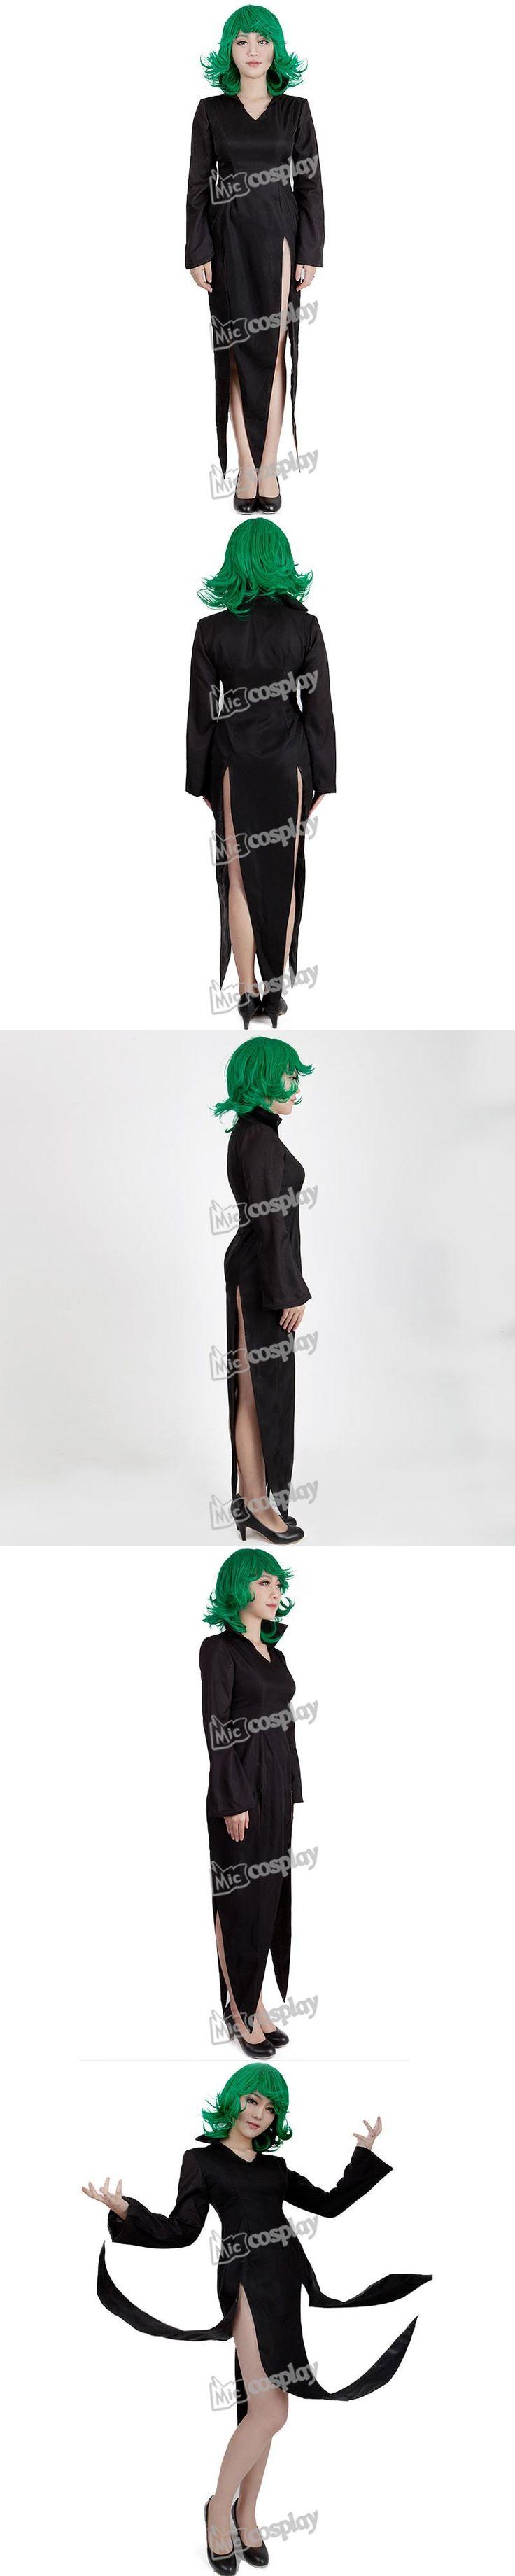 Anime Female One Punch Man Tornado of Terror Cosplay Costume Women Clothing Dress